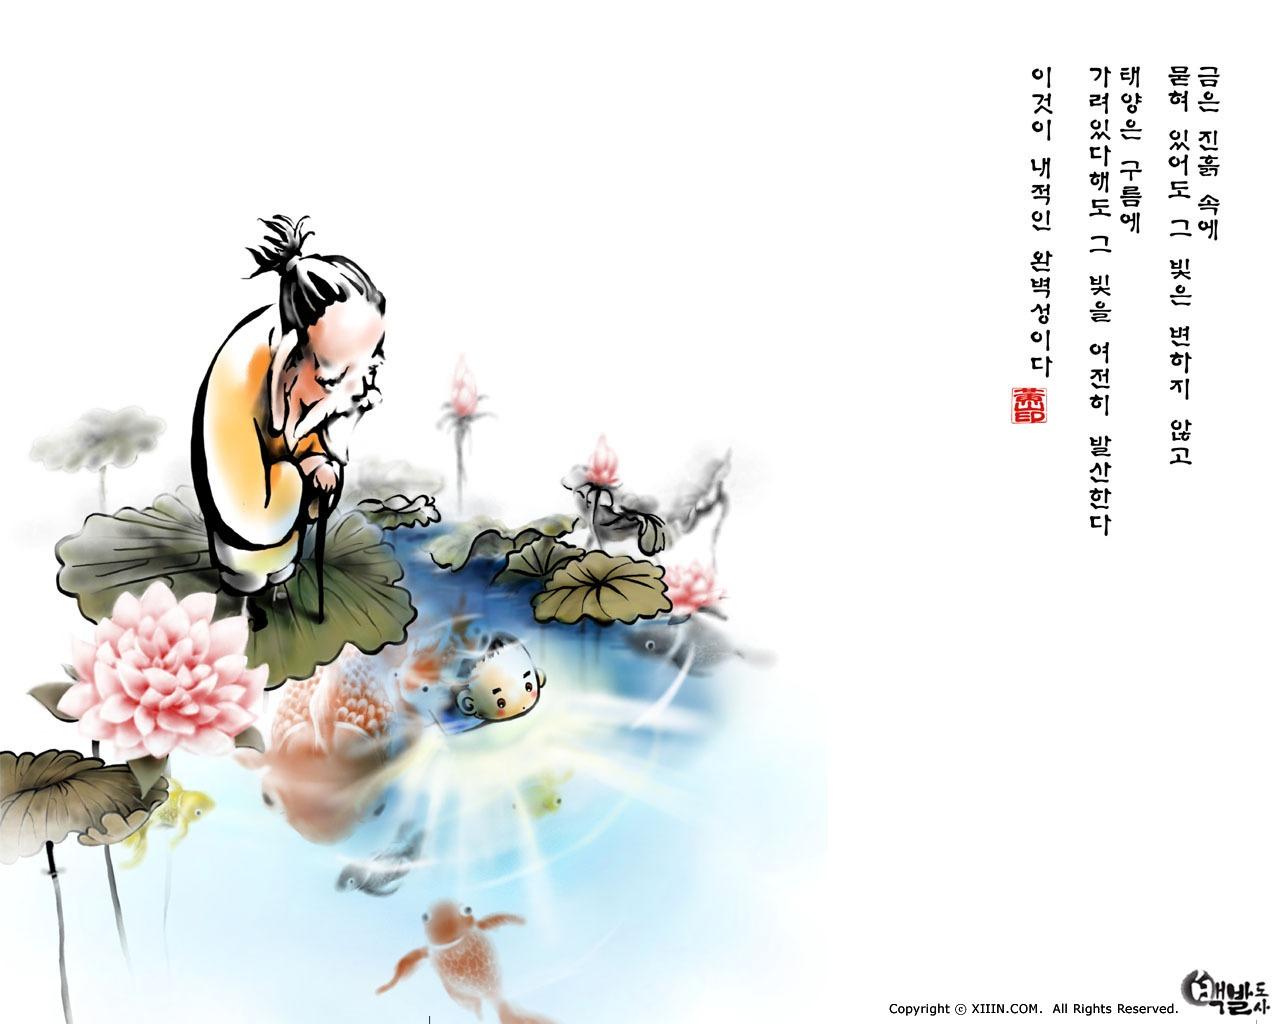 South Korea Ink Wash Cartoon Wallpaper 45 1280x1024 Wallpaper